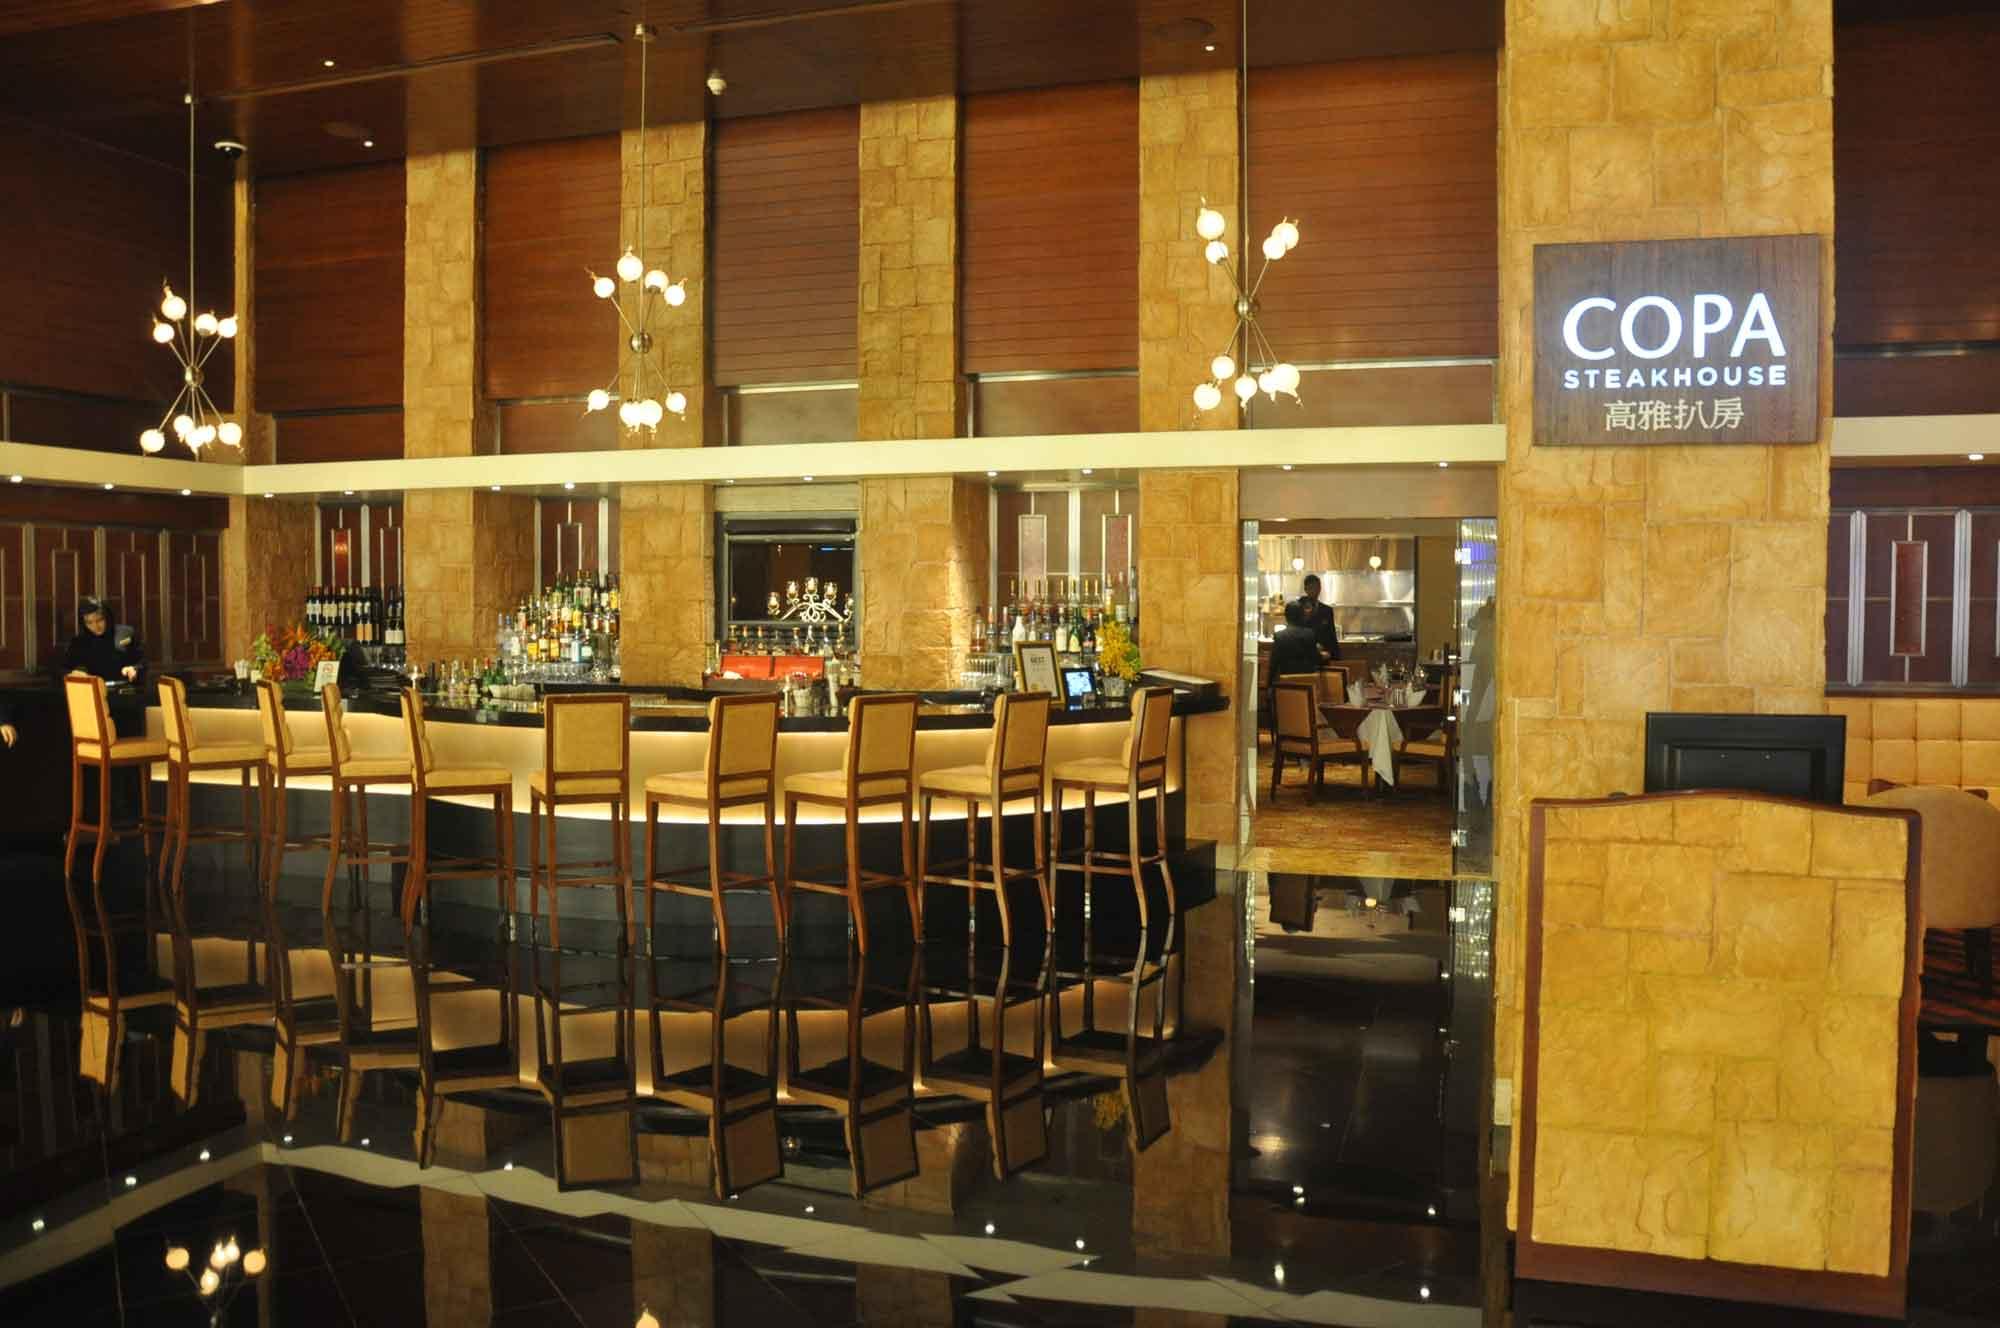 Copa Steakhouse Macau